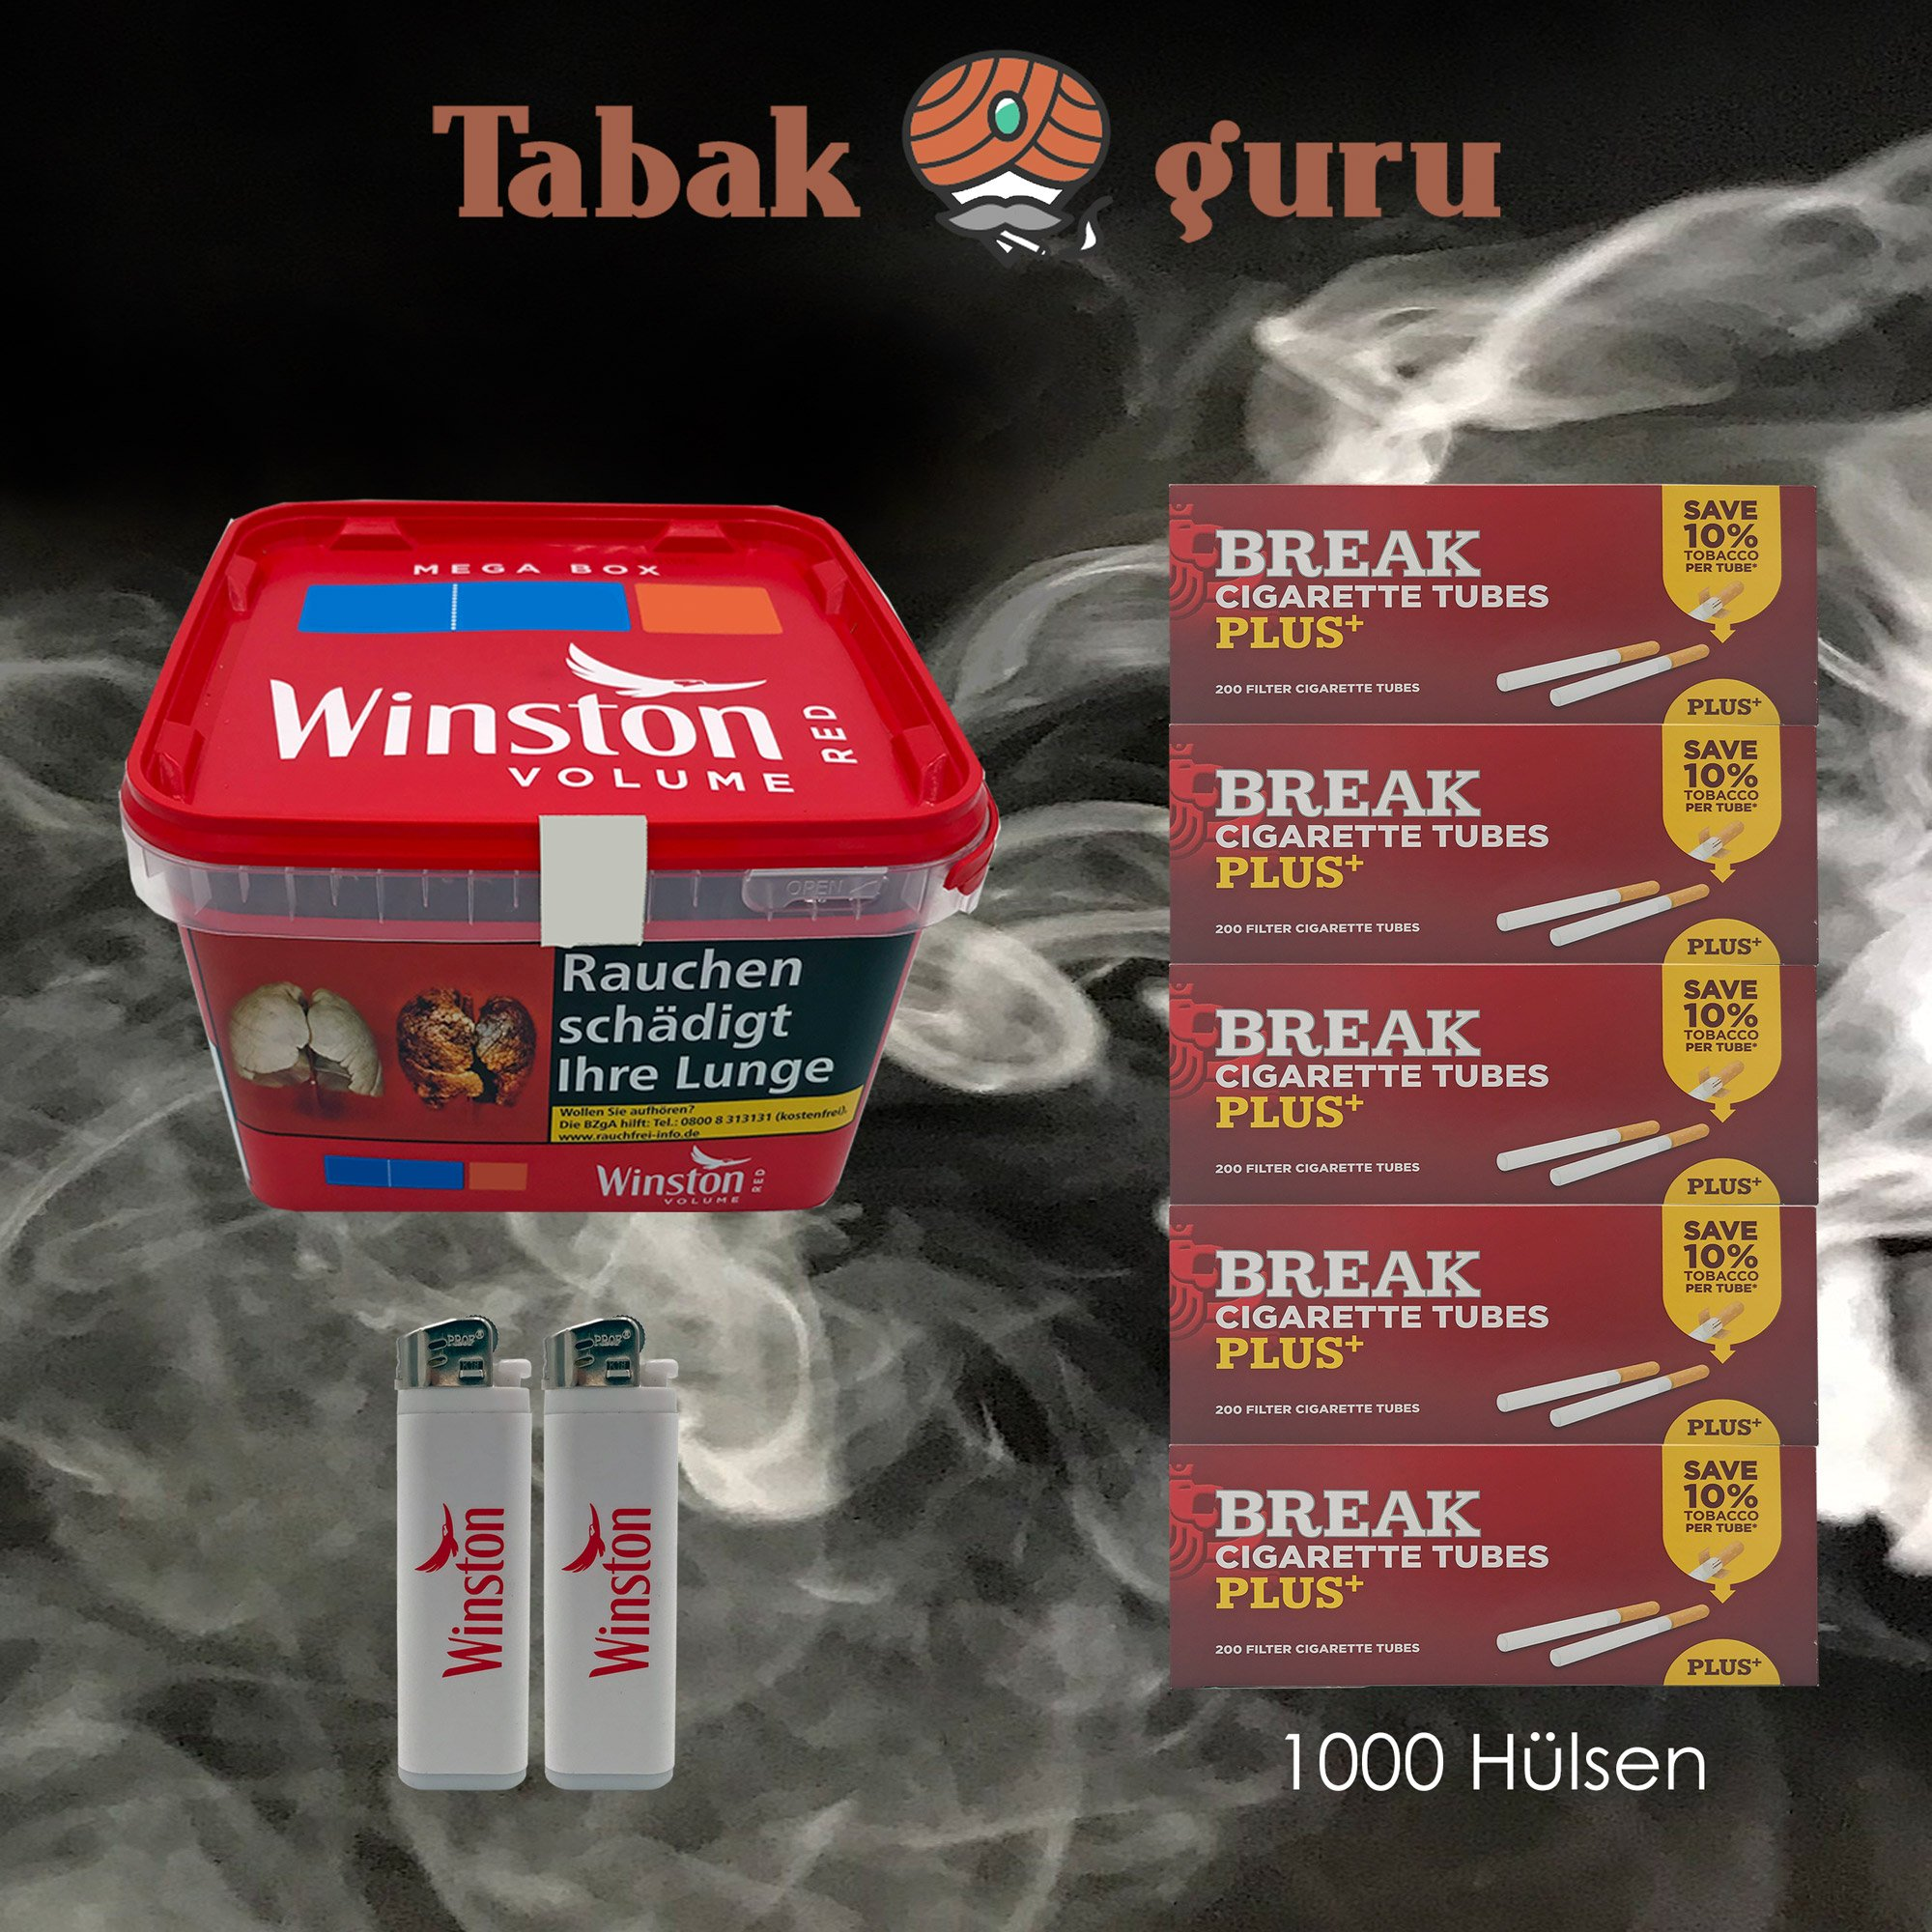 1x Winston Classic Red / Rot Mega Box 170g Volumentabak, 1000 Break Plus Hülsen